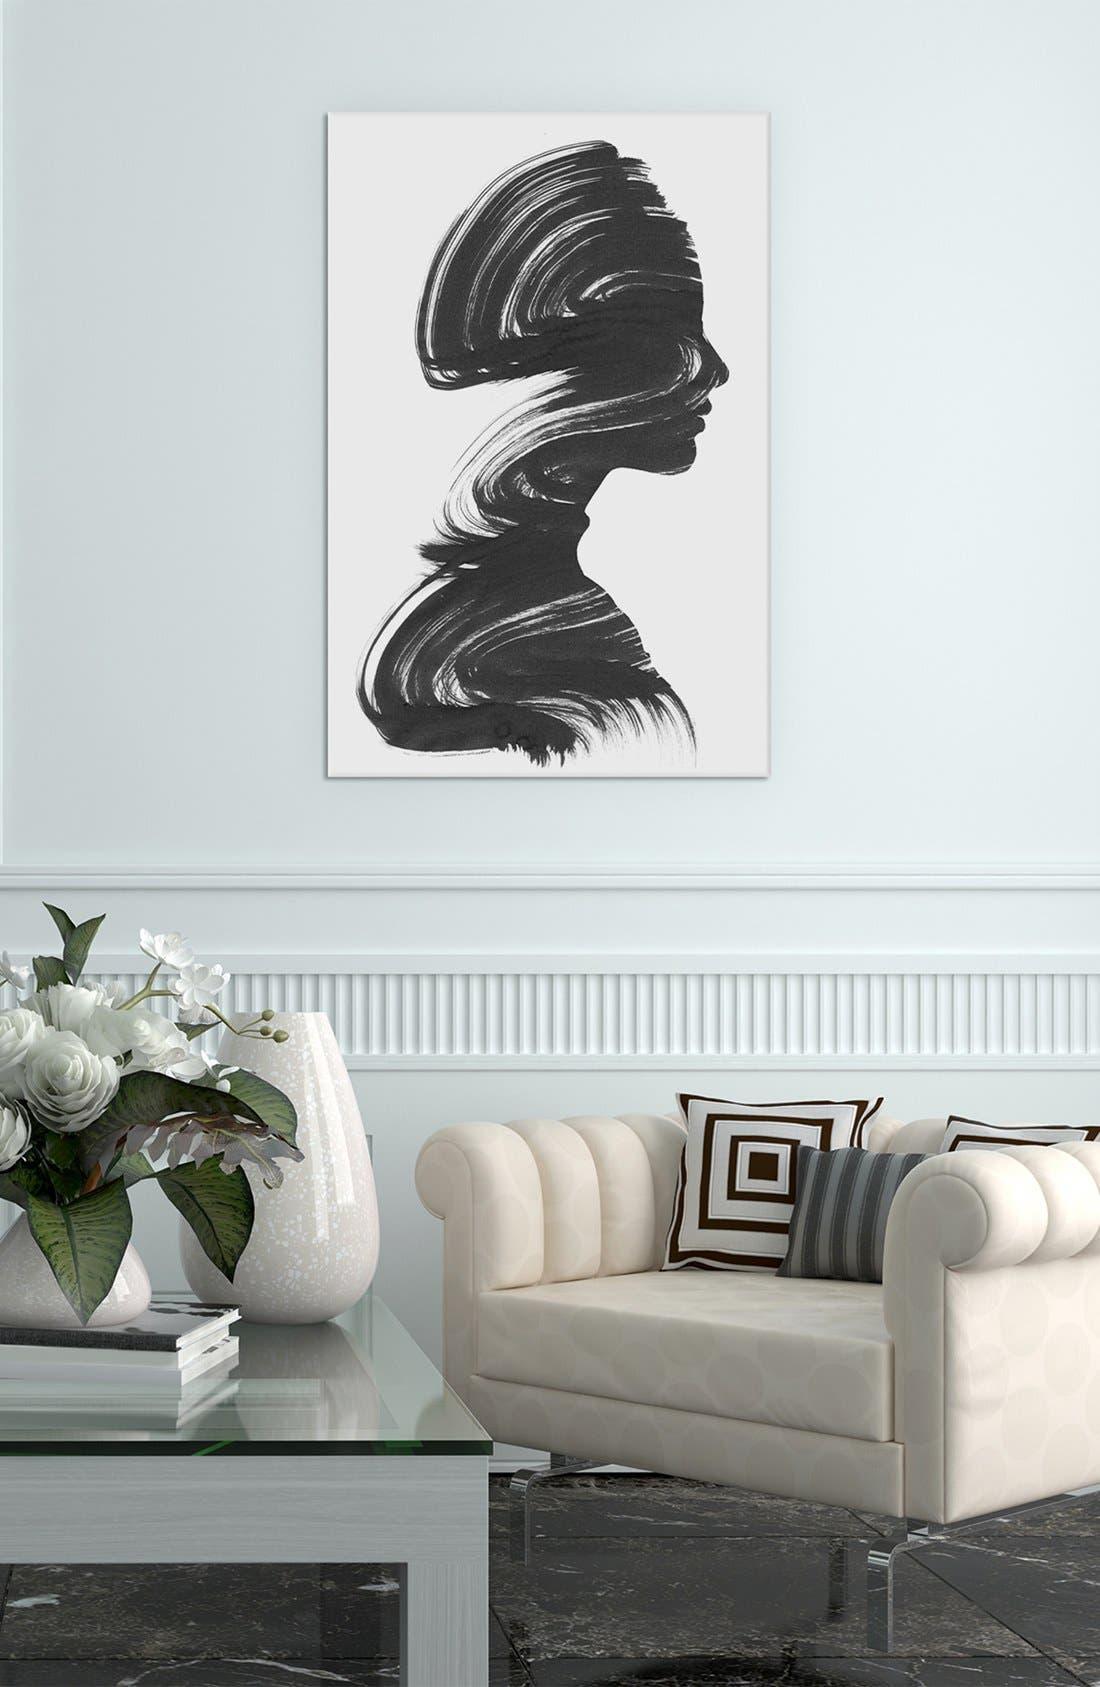 'See' Giclée Print Canvas Art,                             Alternate thumbnail 2, color,                             WHITE